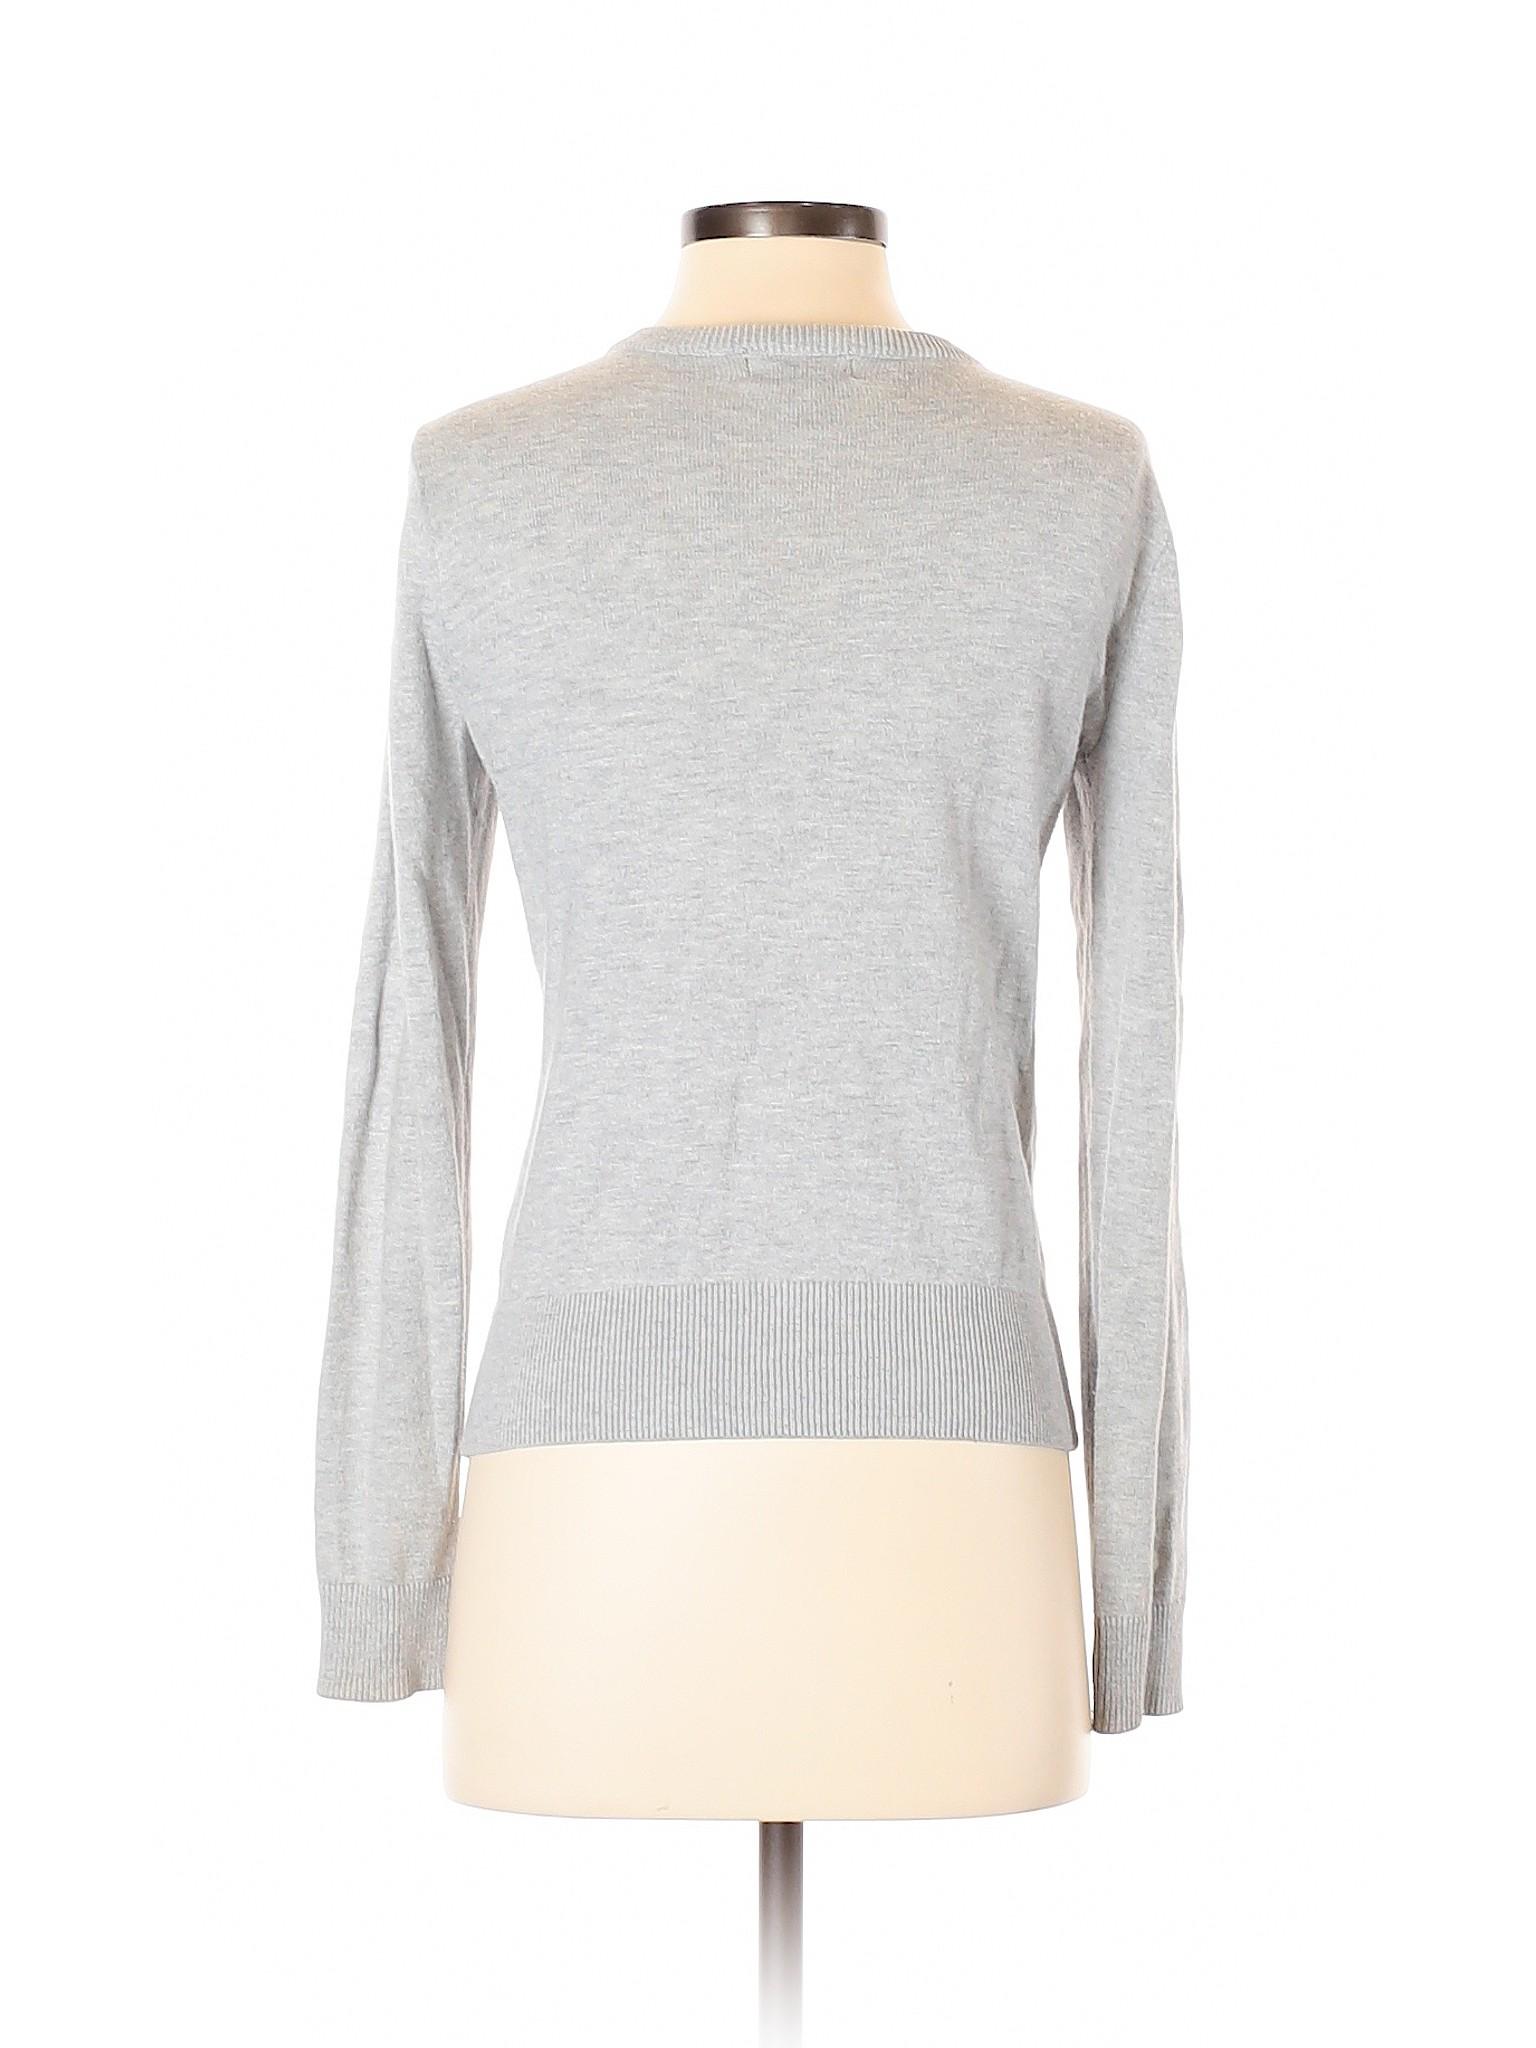 e8eac4a6d Dresses Women's Clothing Sale & Clearance 2019 - Macy's